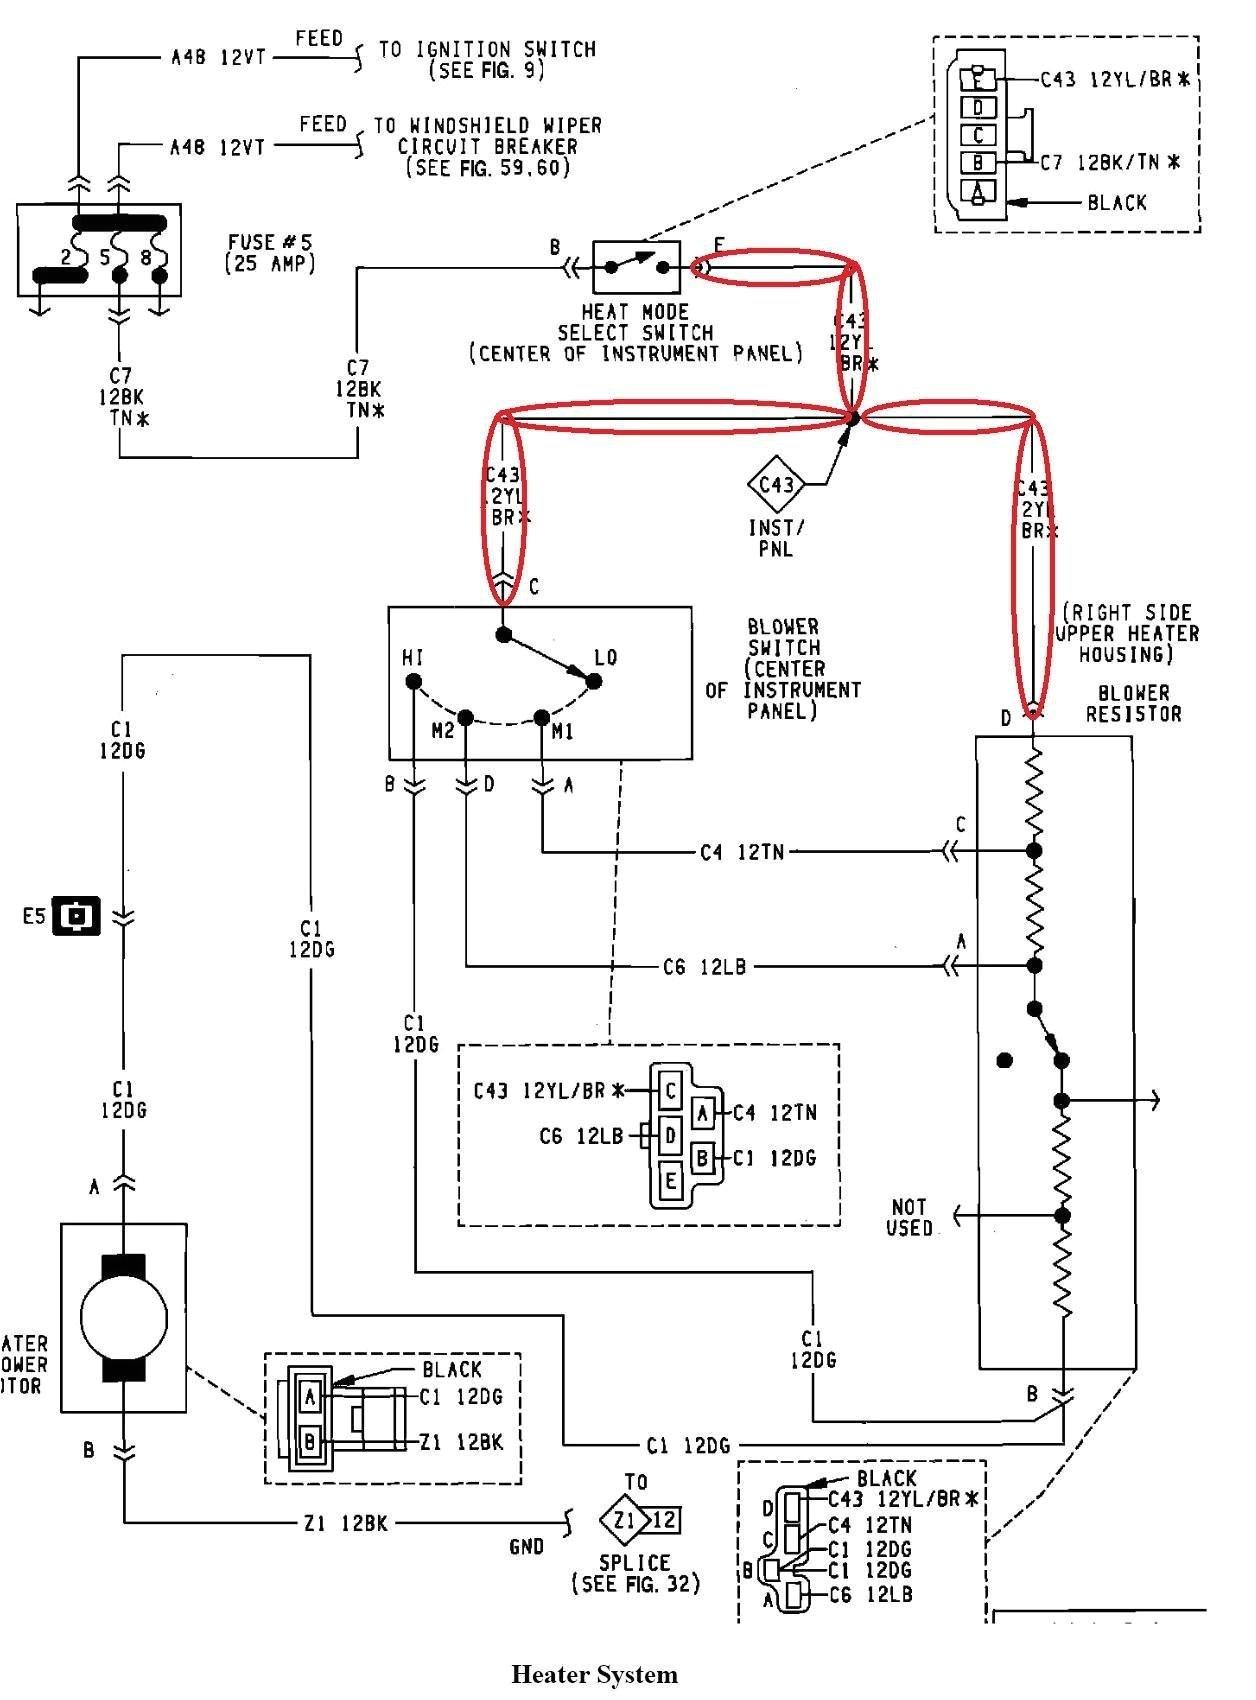 ezgo headlight wiring diagram my wiring diagramezgo wire diagram wiring diagram ezgo headlight wiring diagram source